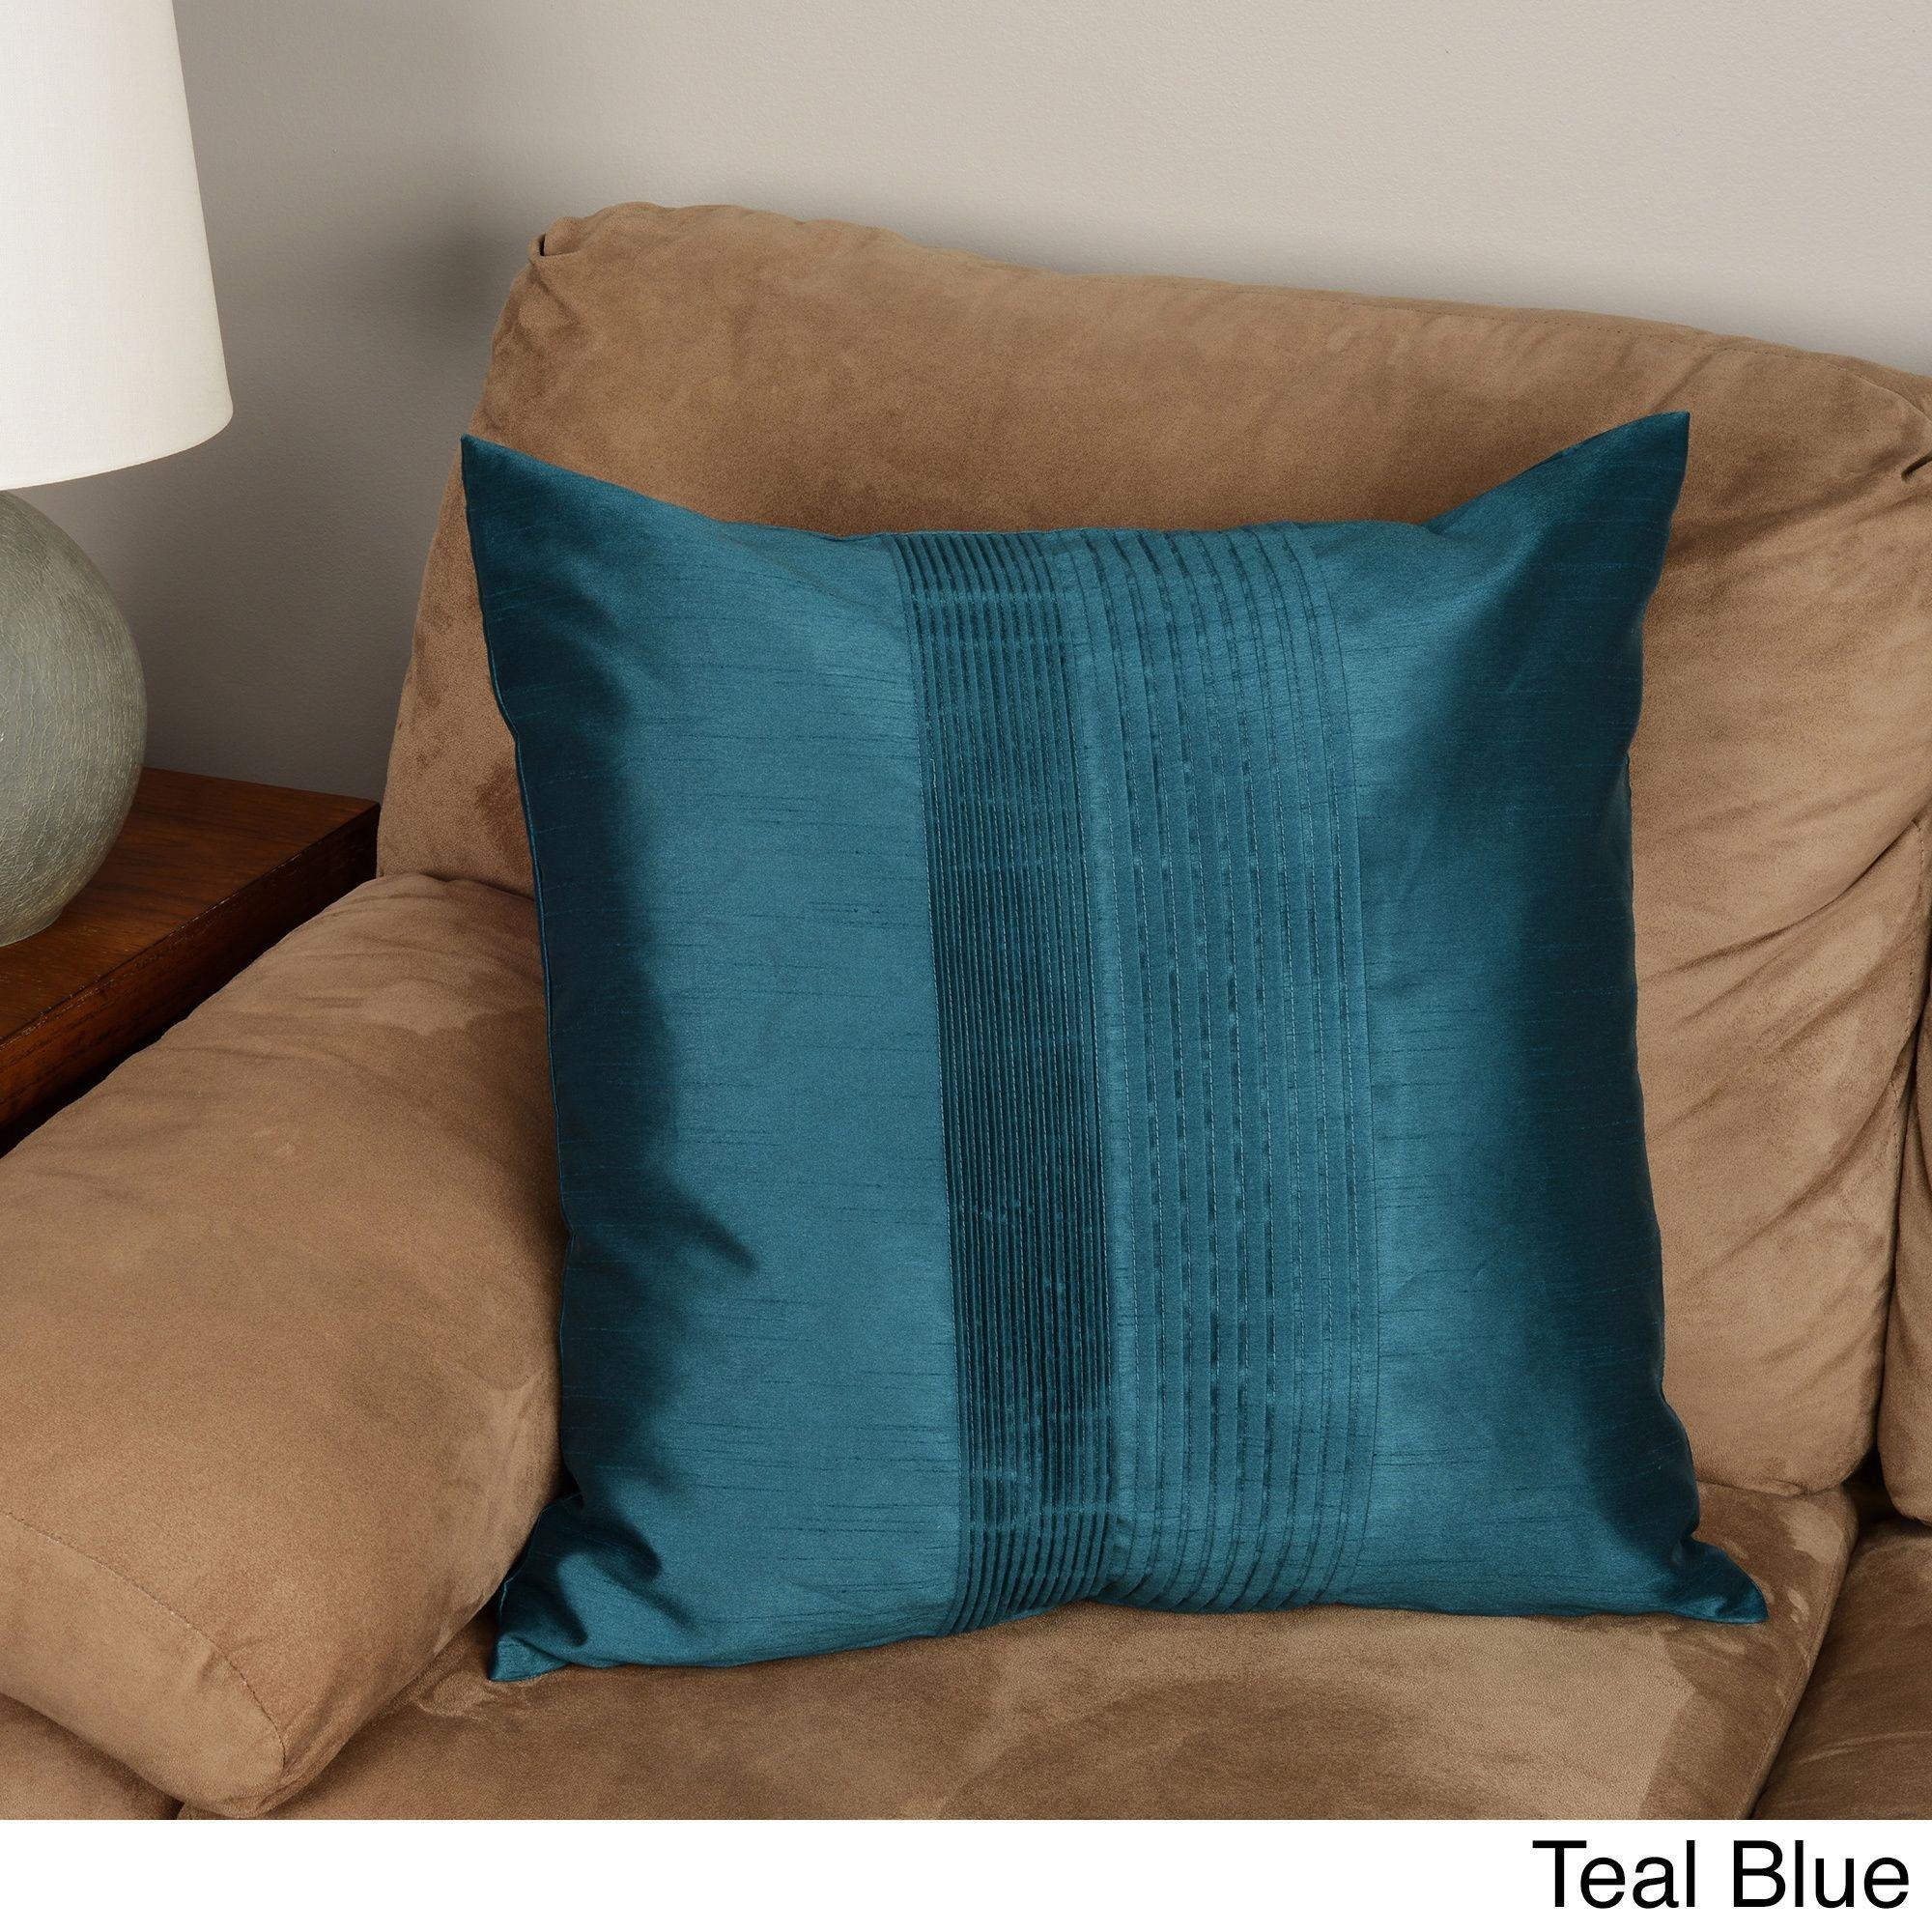 Fabulous Stupendous Unique Ideas Decorative Pillows Patterns Color Evergreenethics Interior Chair Design Evergreenethicsorg